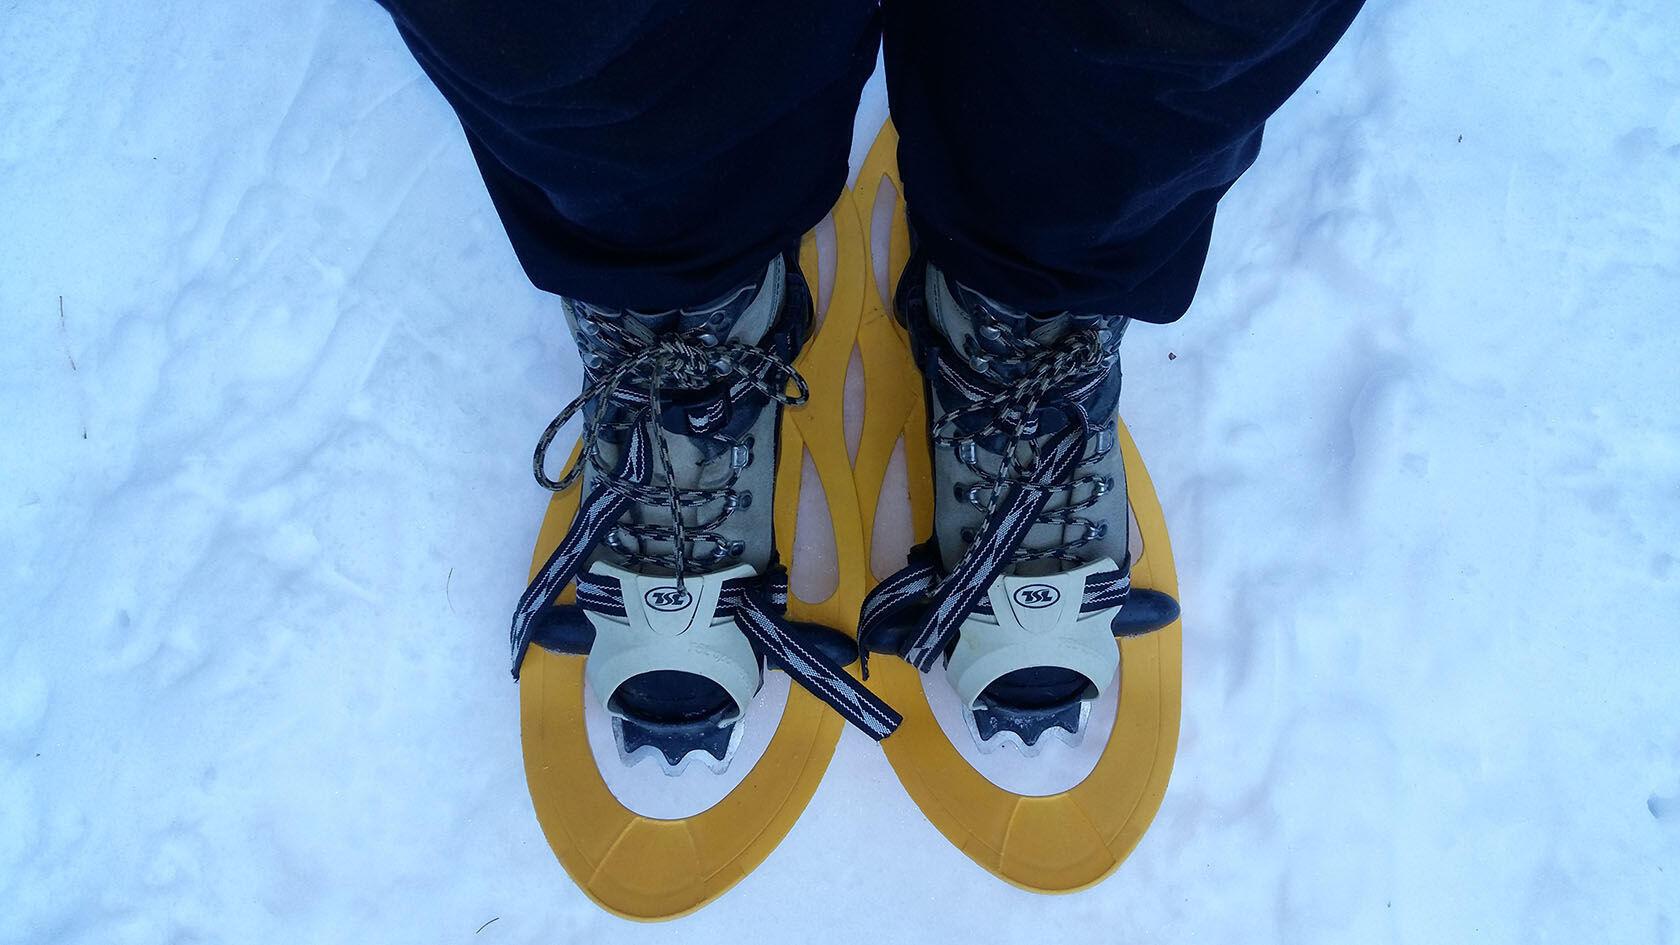 Winter Provence Snowshoe Mercantour Equipment